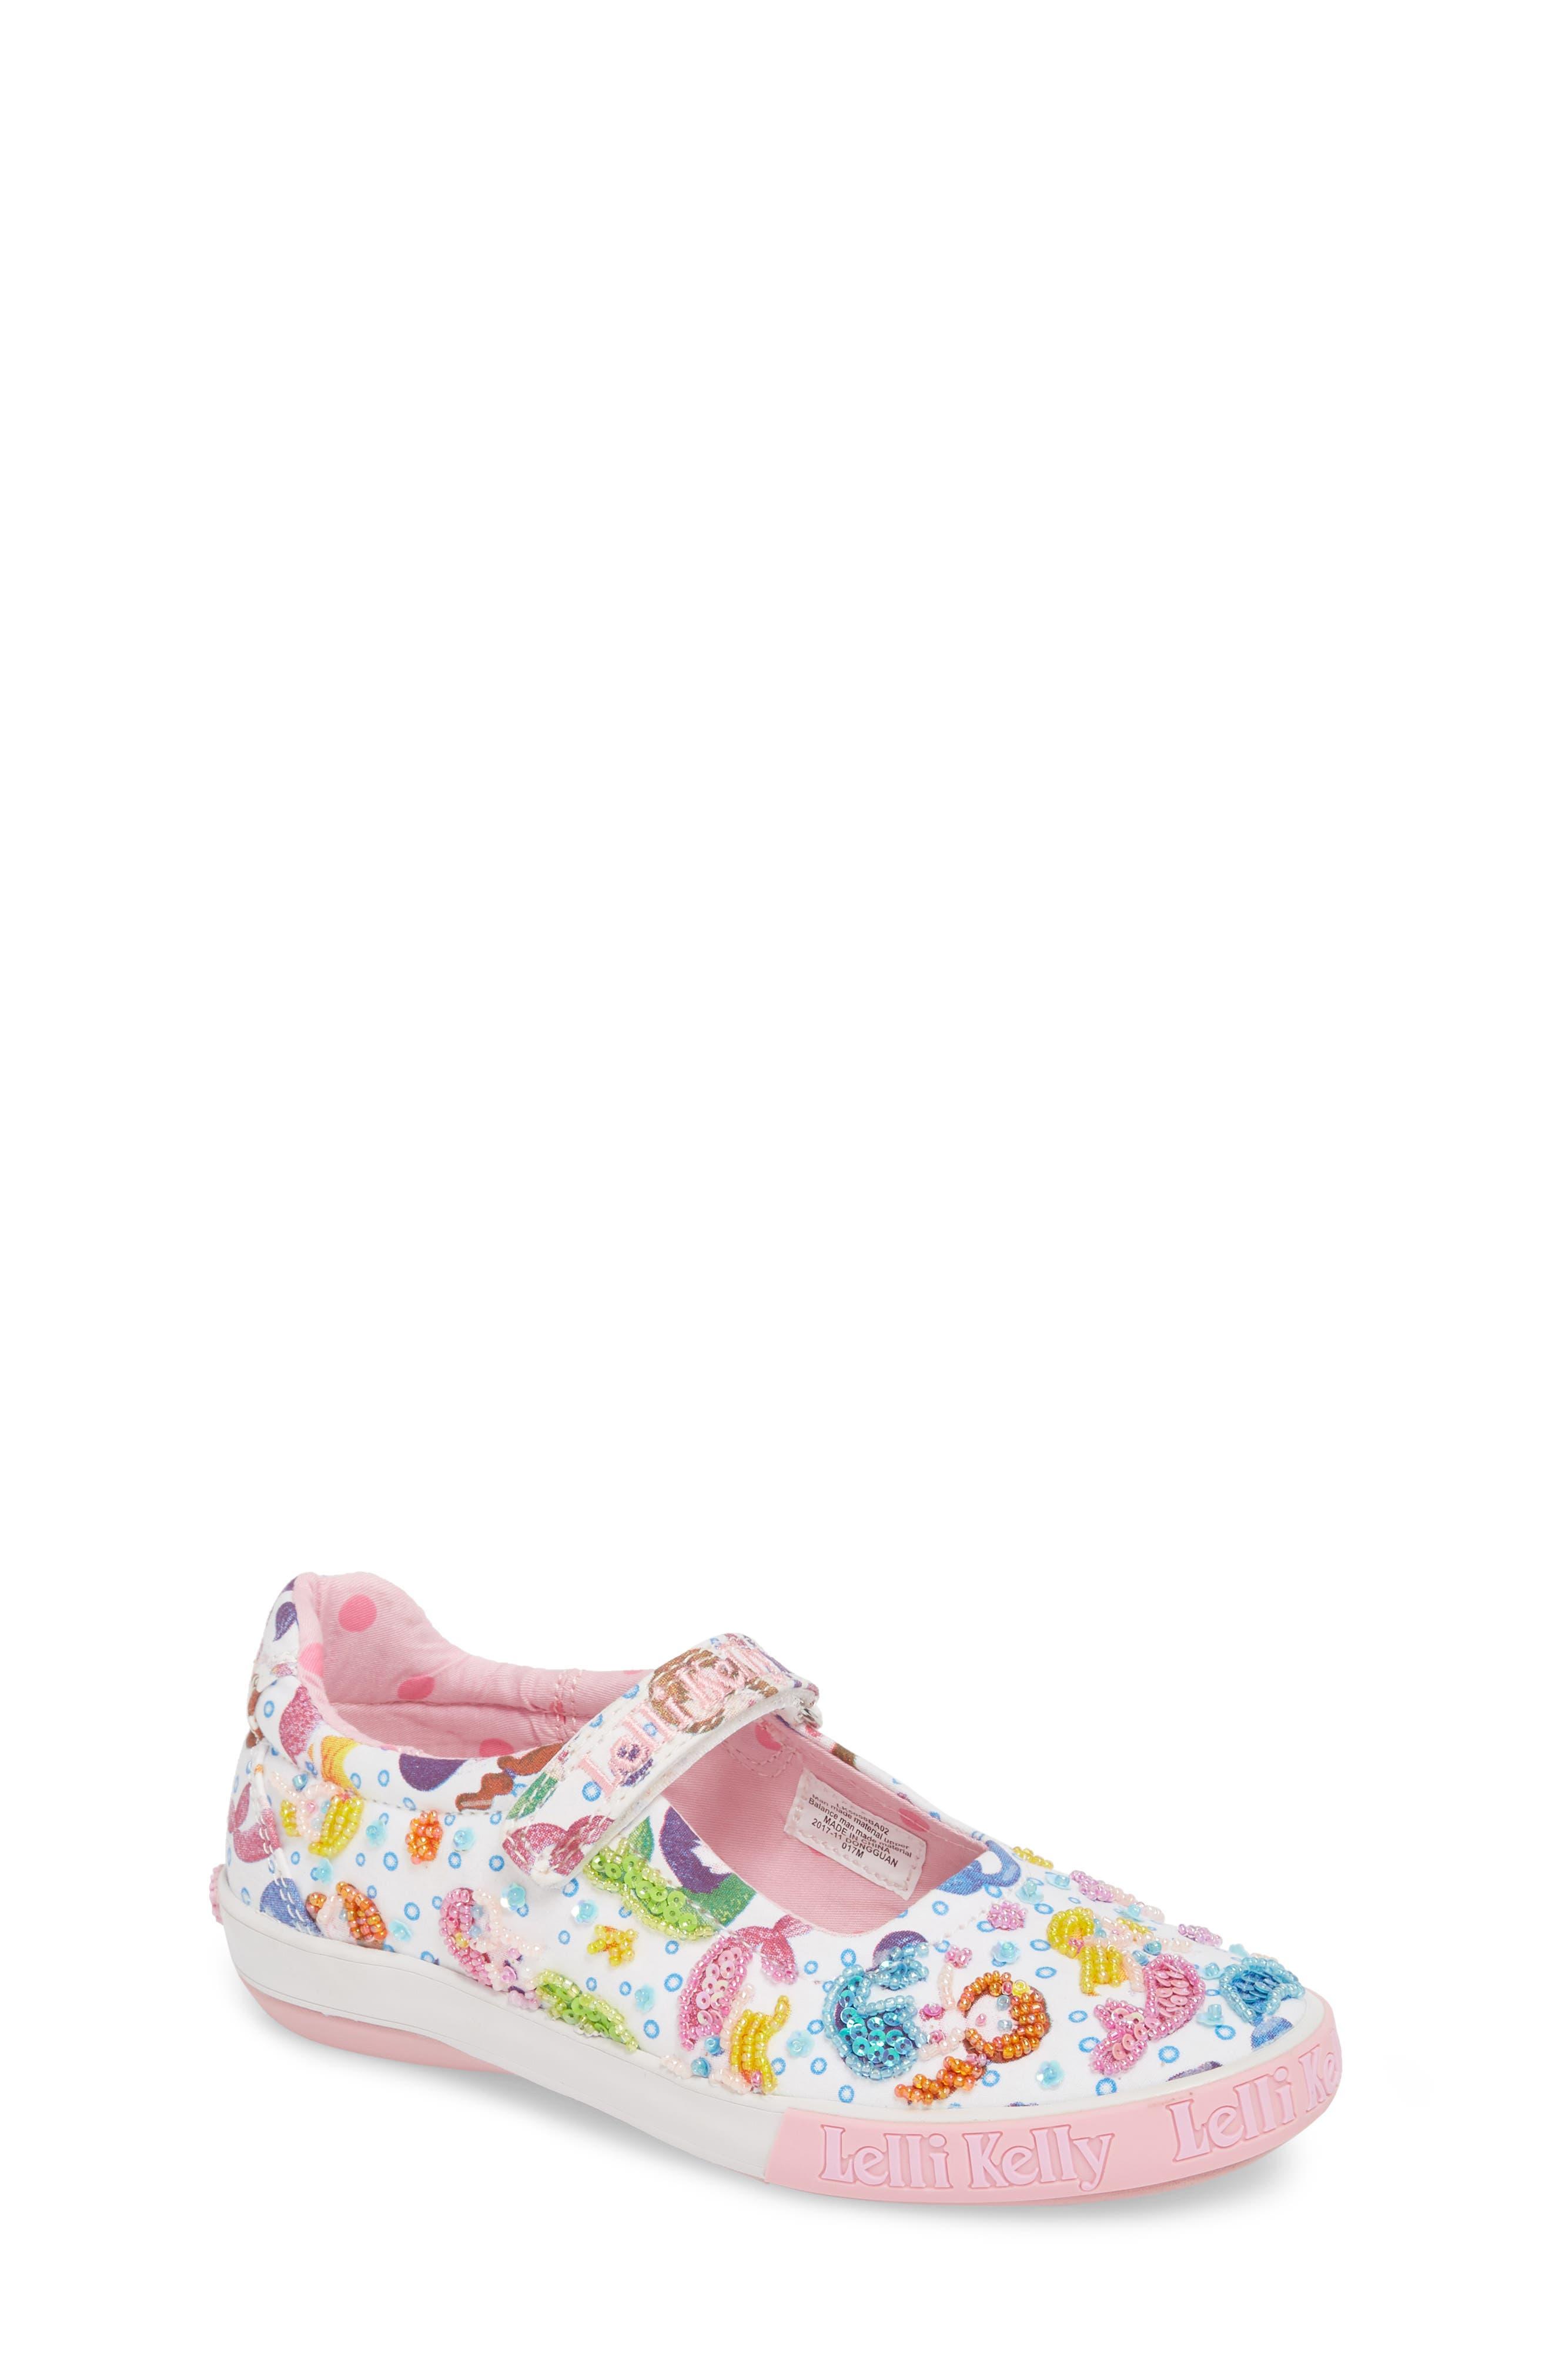 Beaded Mary Jane Sneaker,                         Main,                         color, WHITE